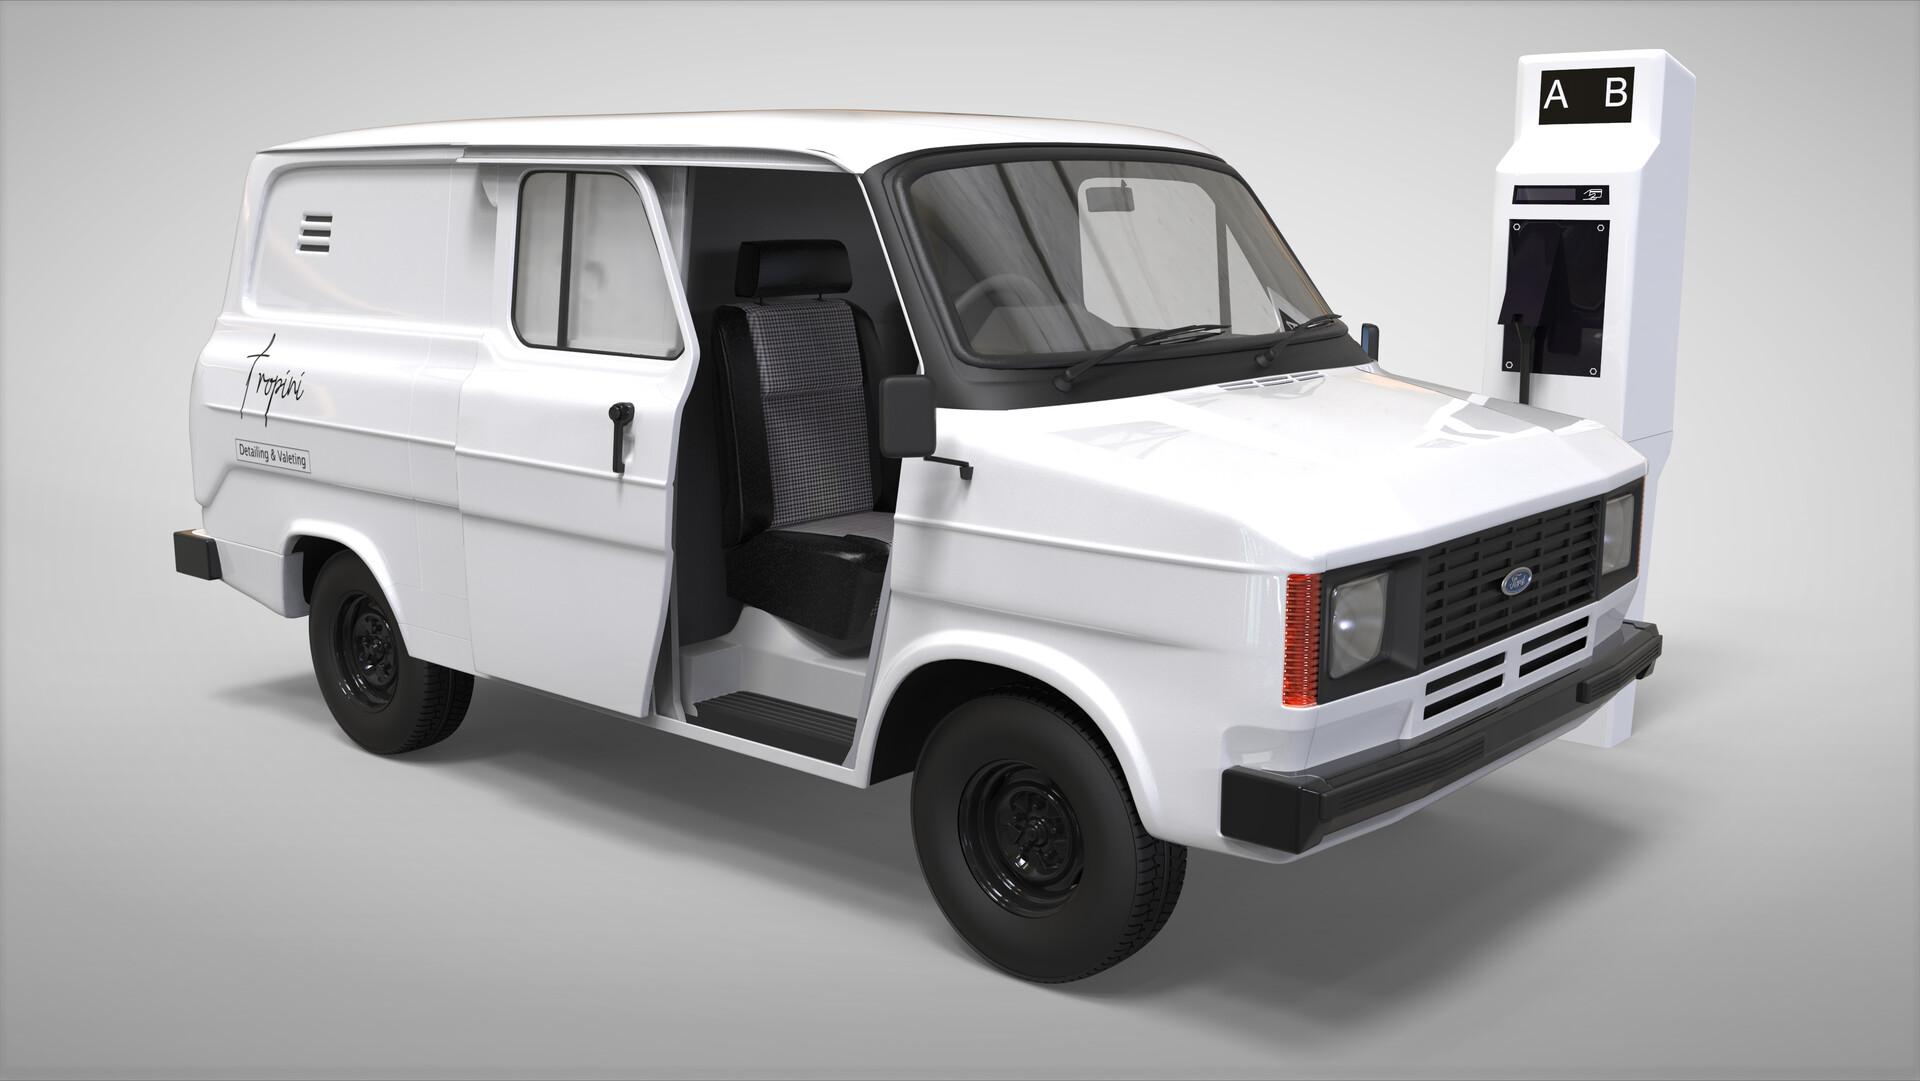 Render V1 - Short wheelbase version